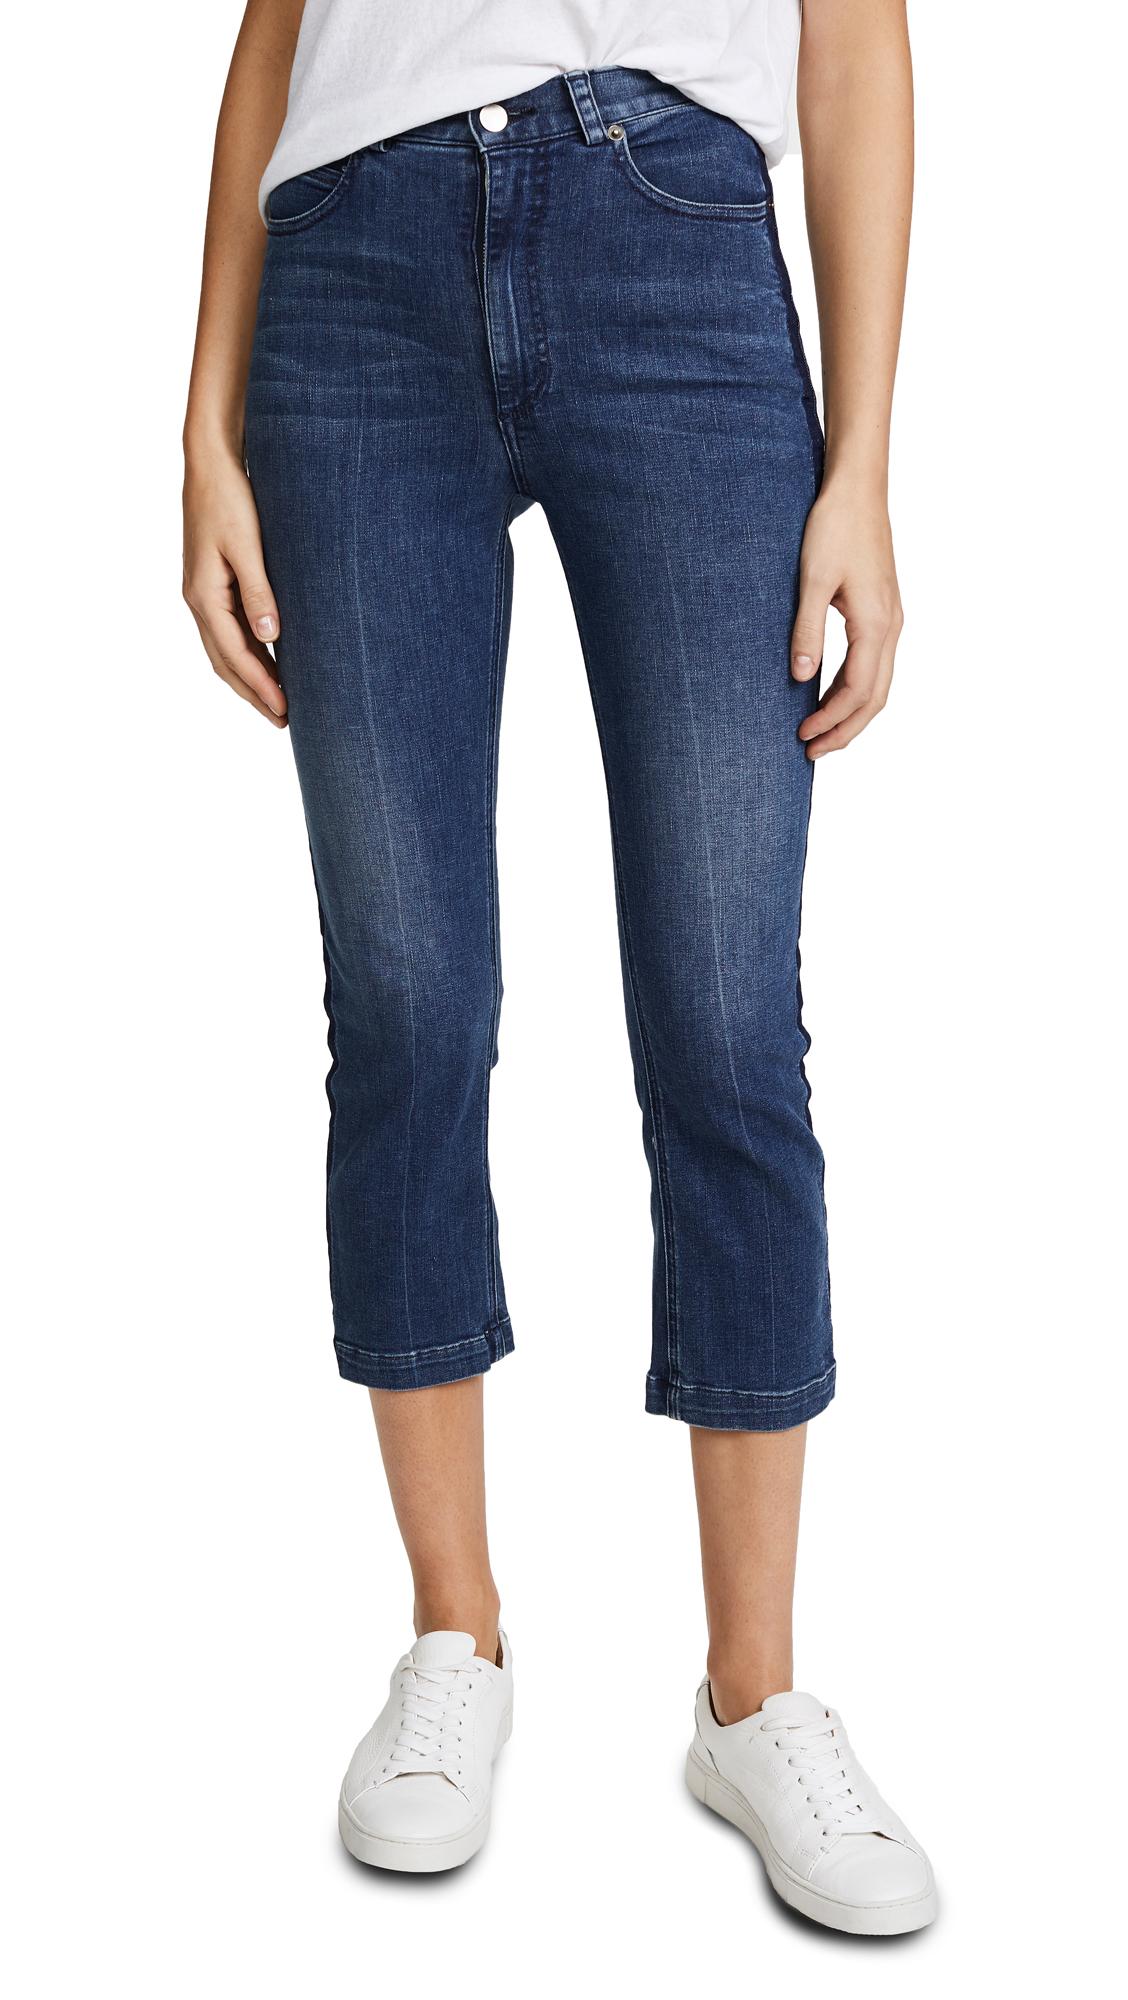 Rachel Comey Cropped Tux Jeans - Classic Indigo Wash